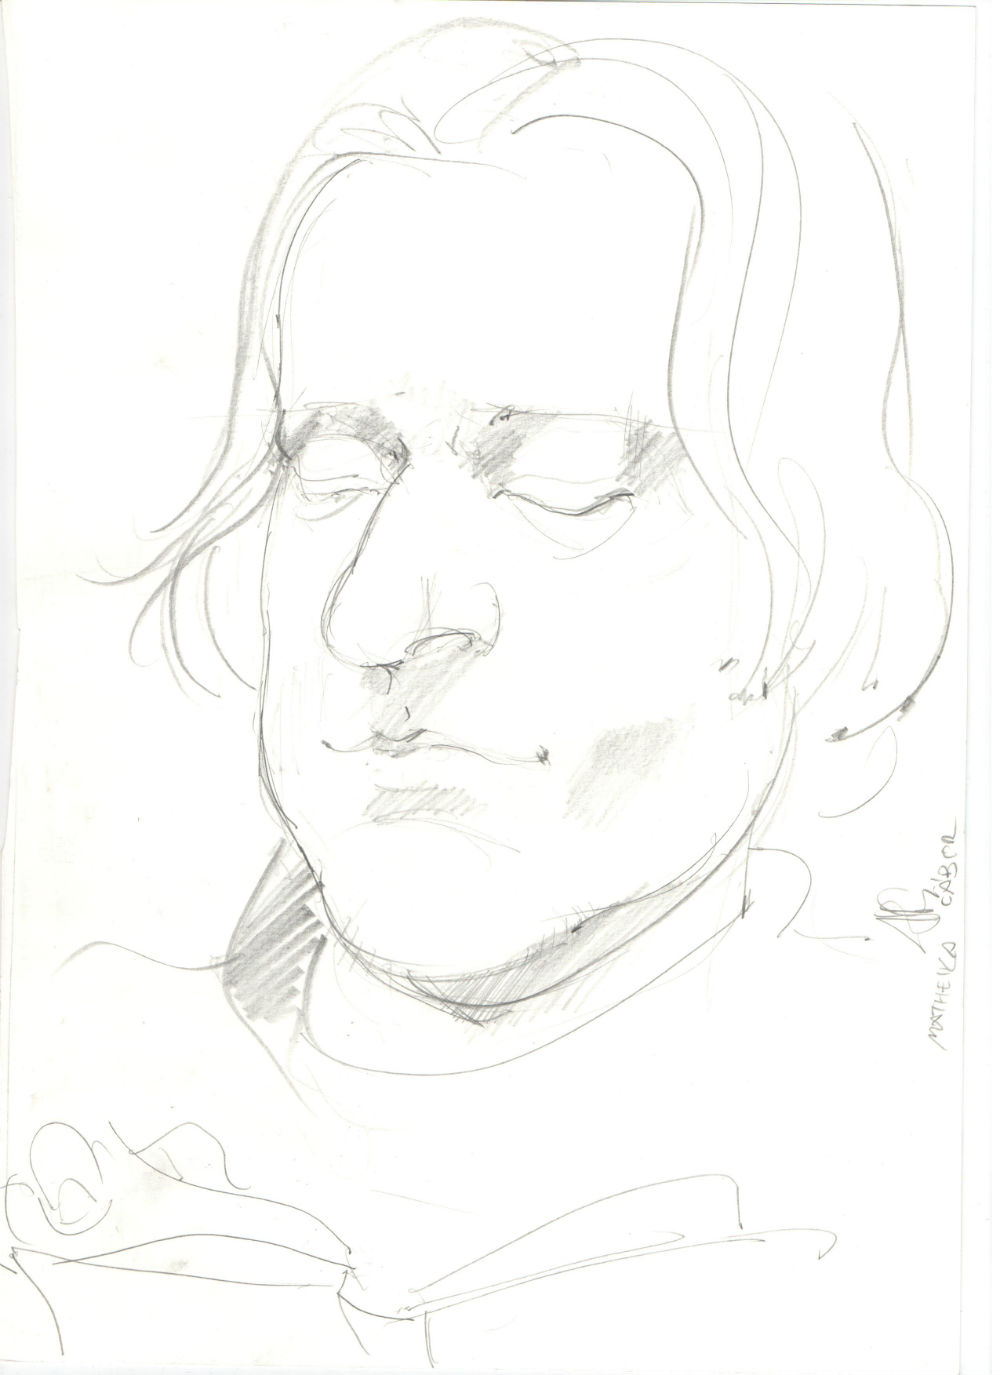 Hazai Attila - Matheika Gábor rajza